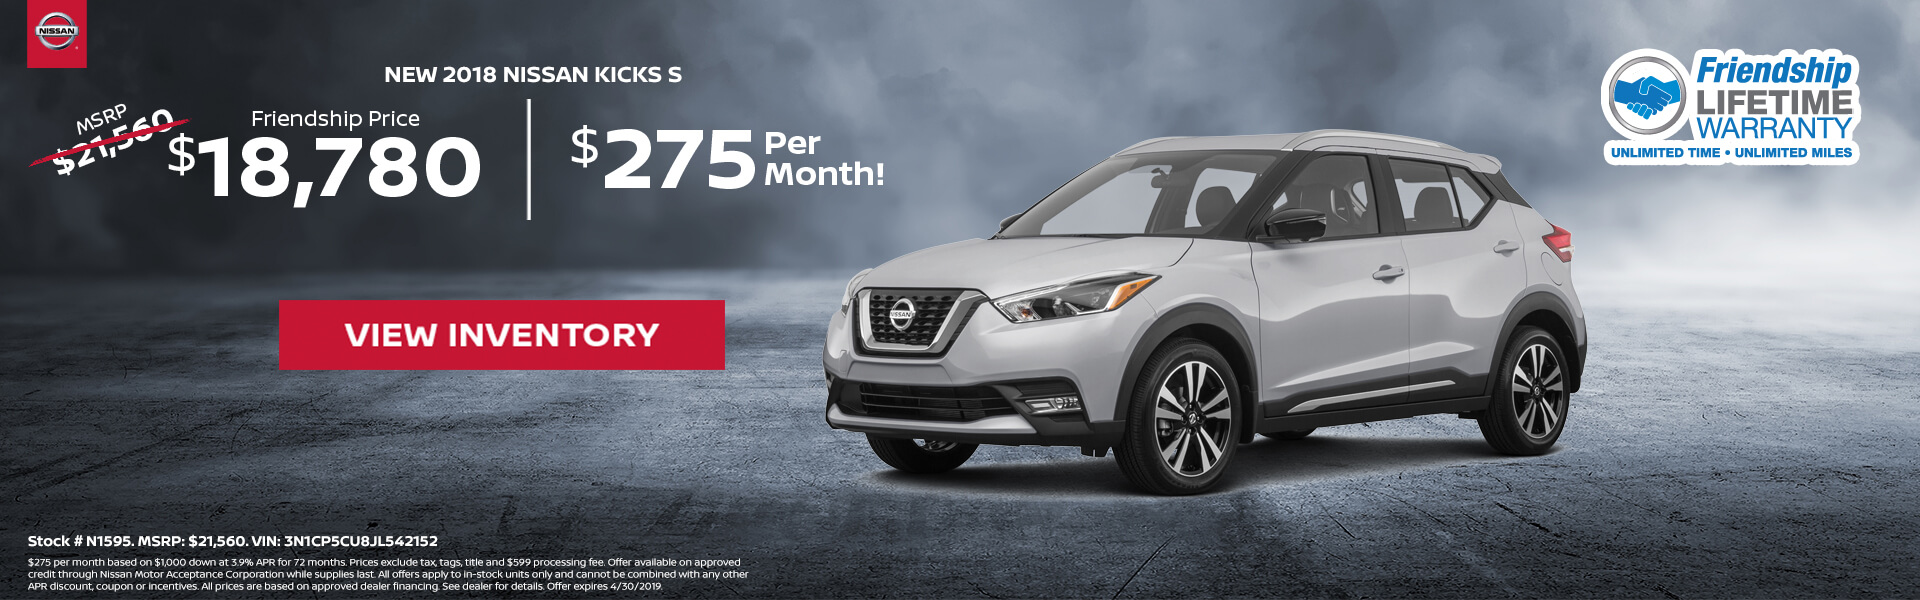 Nissan Kicks $18,780 Purchase